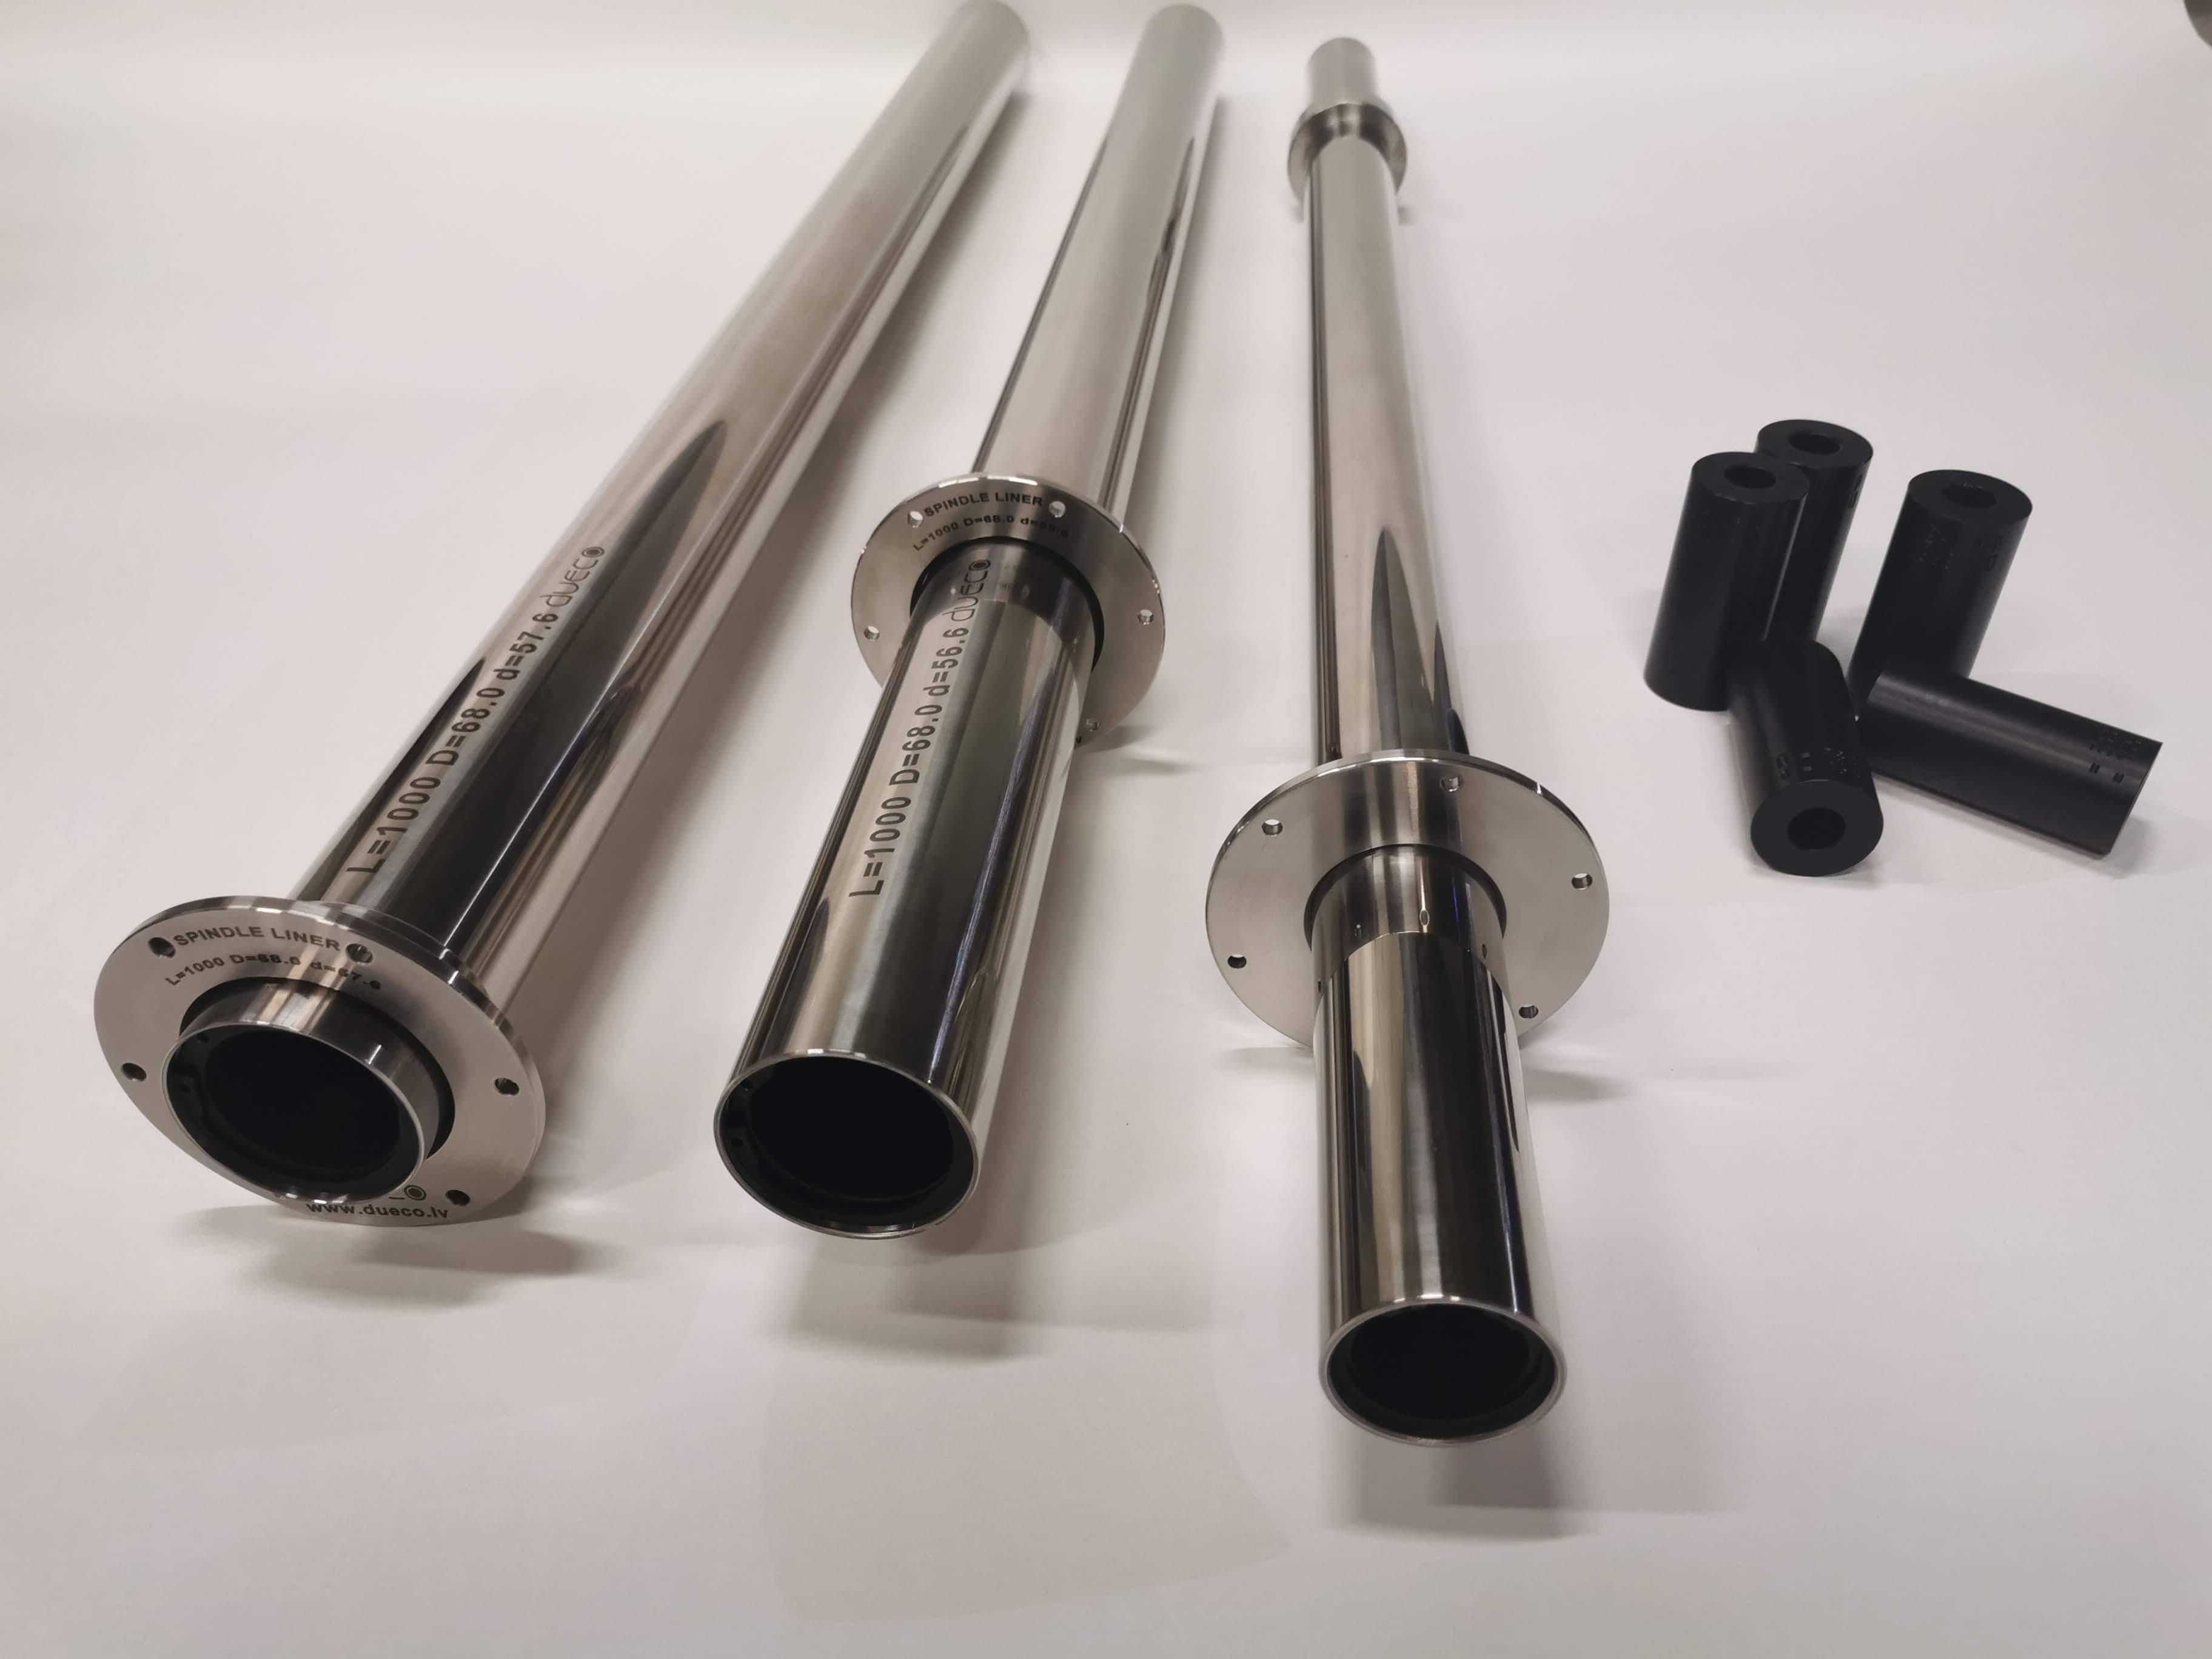 metālapsrāde_dueco_spindle liner_CNC virpas vārpstu redukcijas caurules_lathe